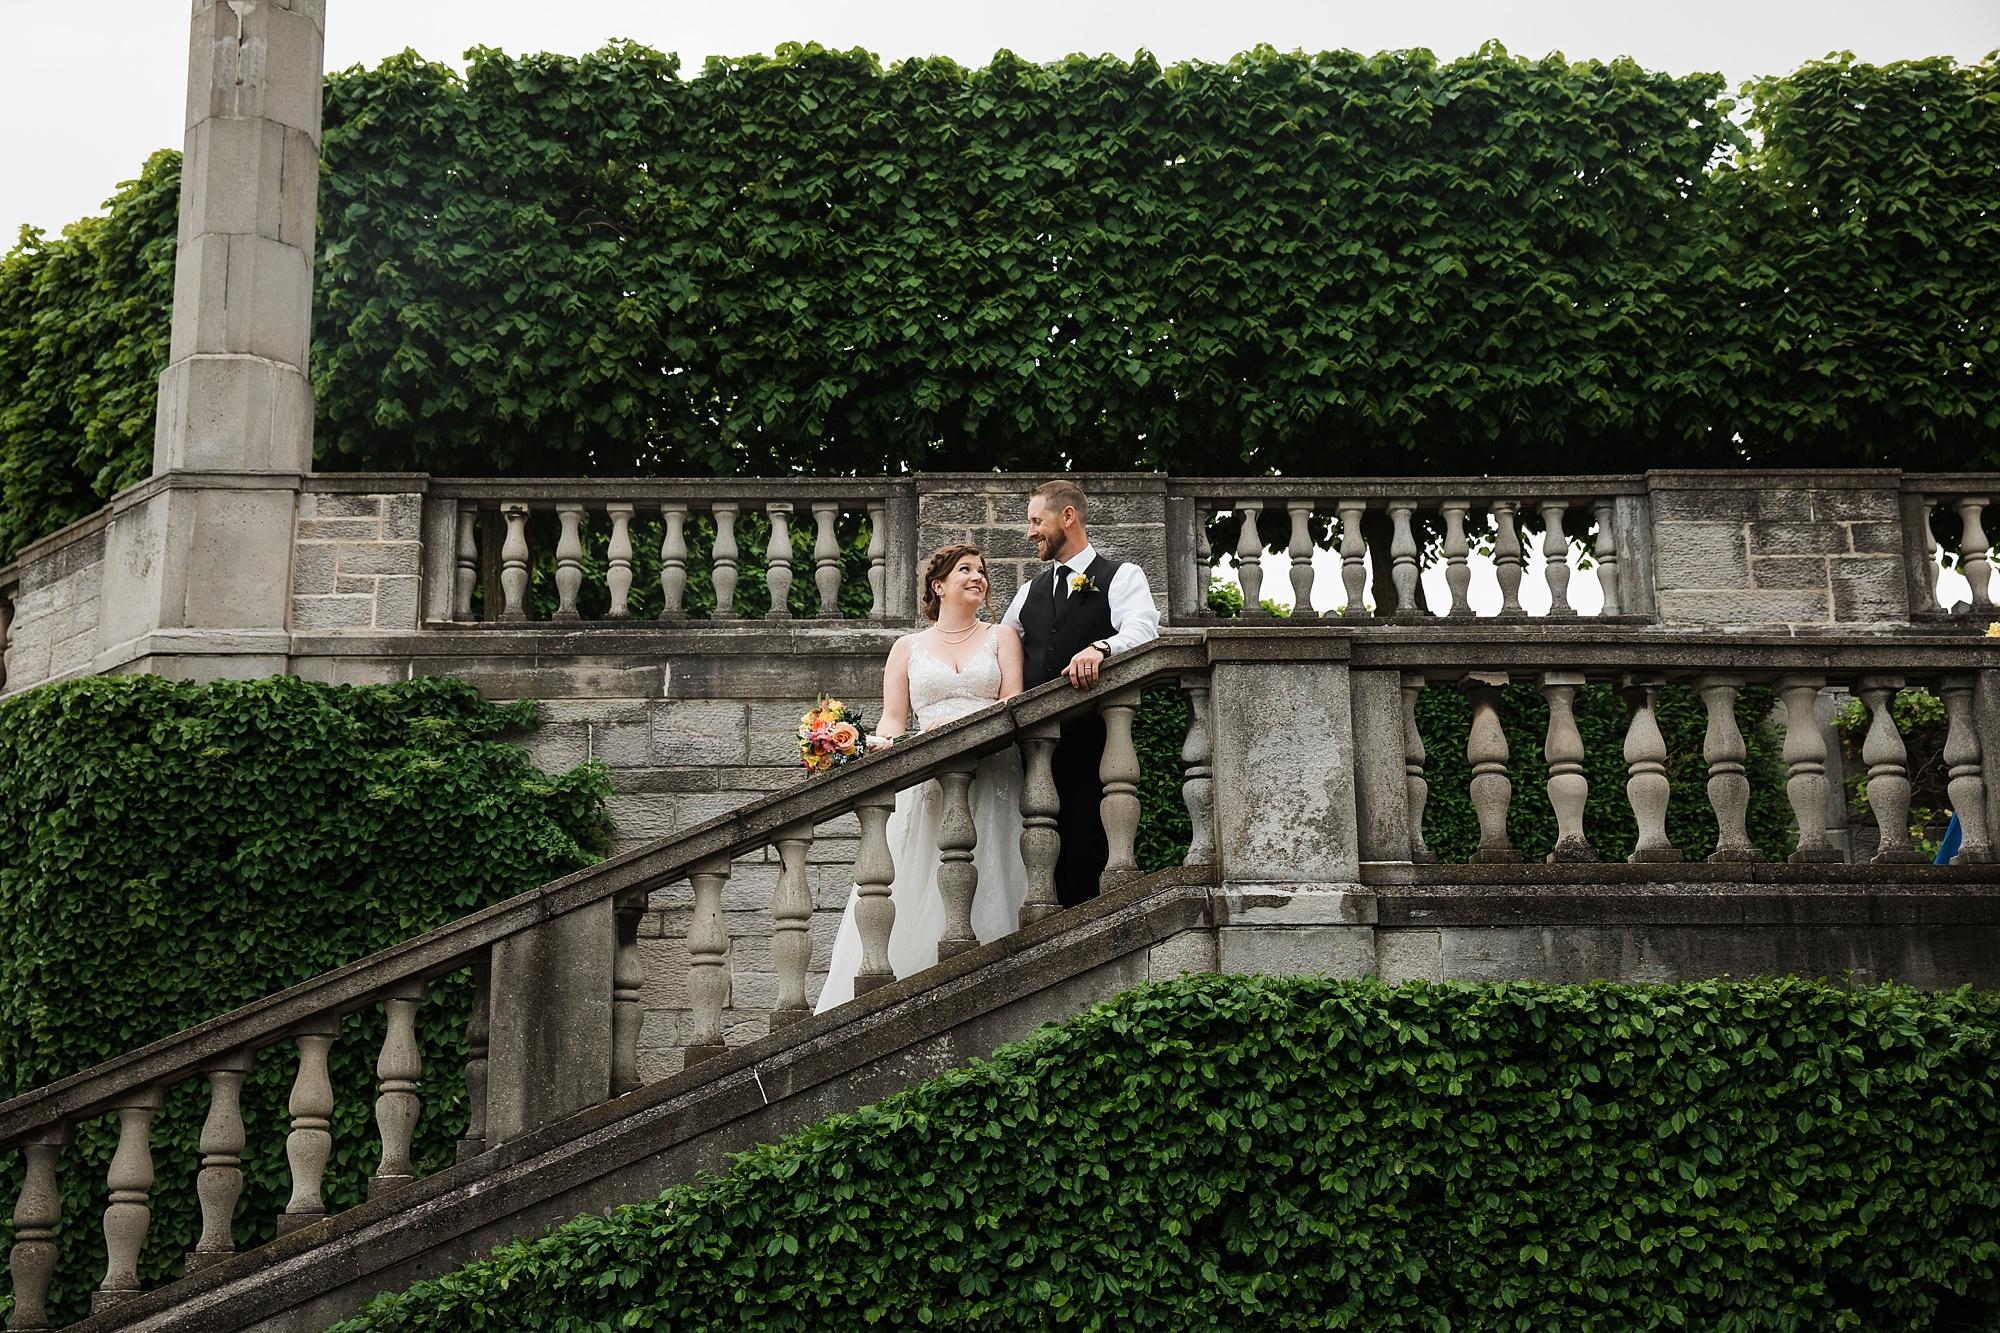 niagarafalls-weddingphotography_0054.jpg